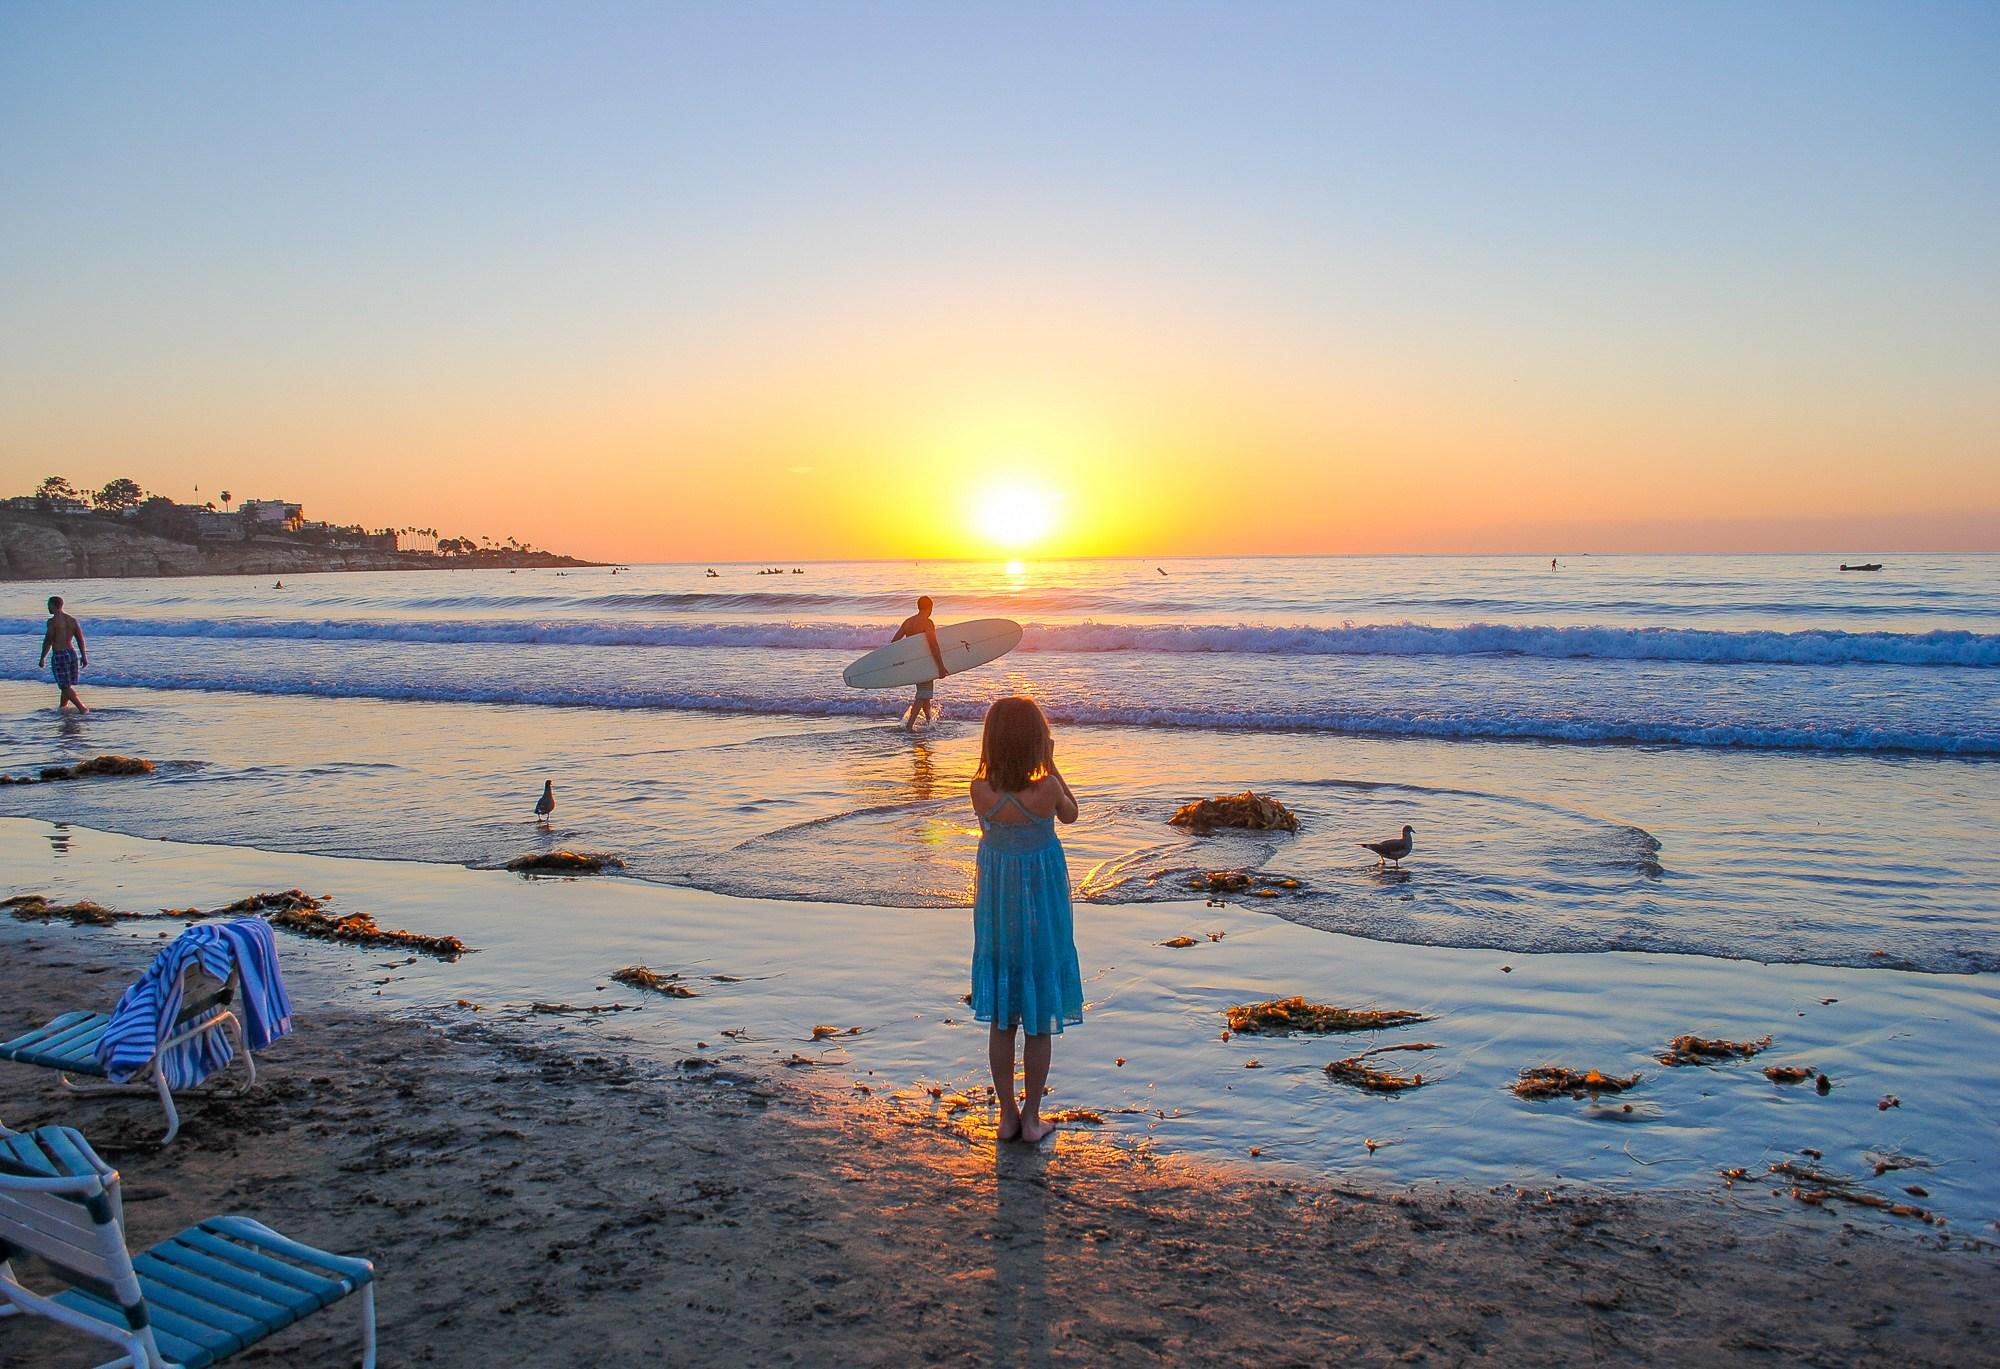 San Diego, California beach scene